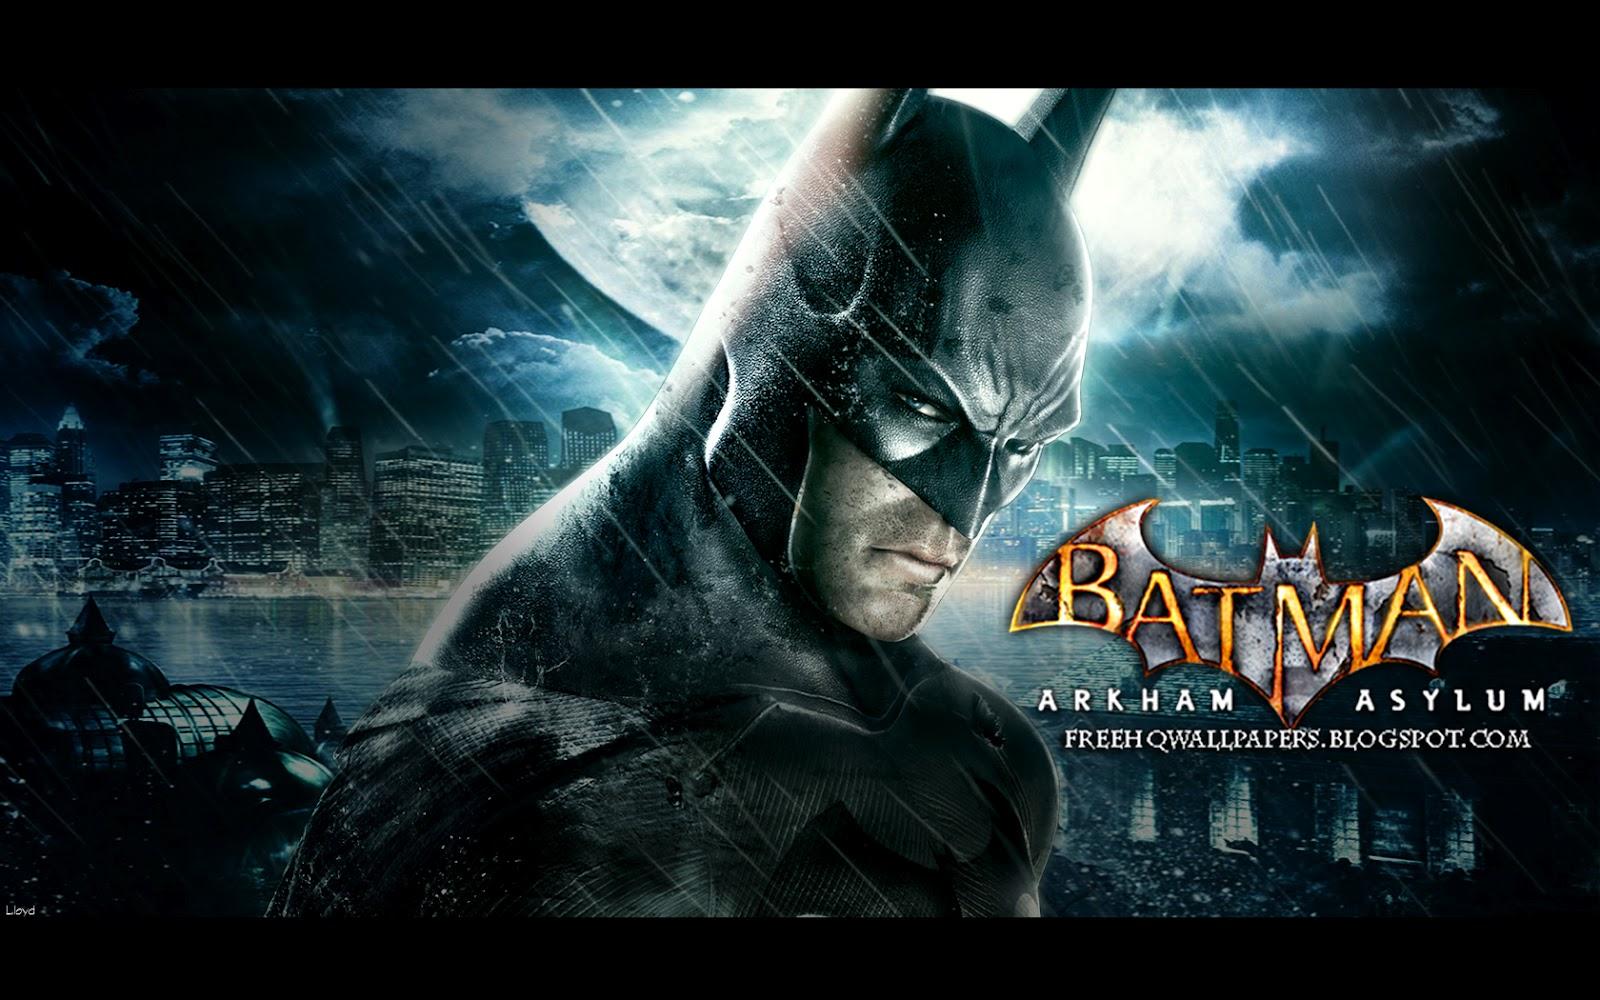 Batman Arkham Asylum HQ HQ Wallpapers 1600x1000